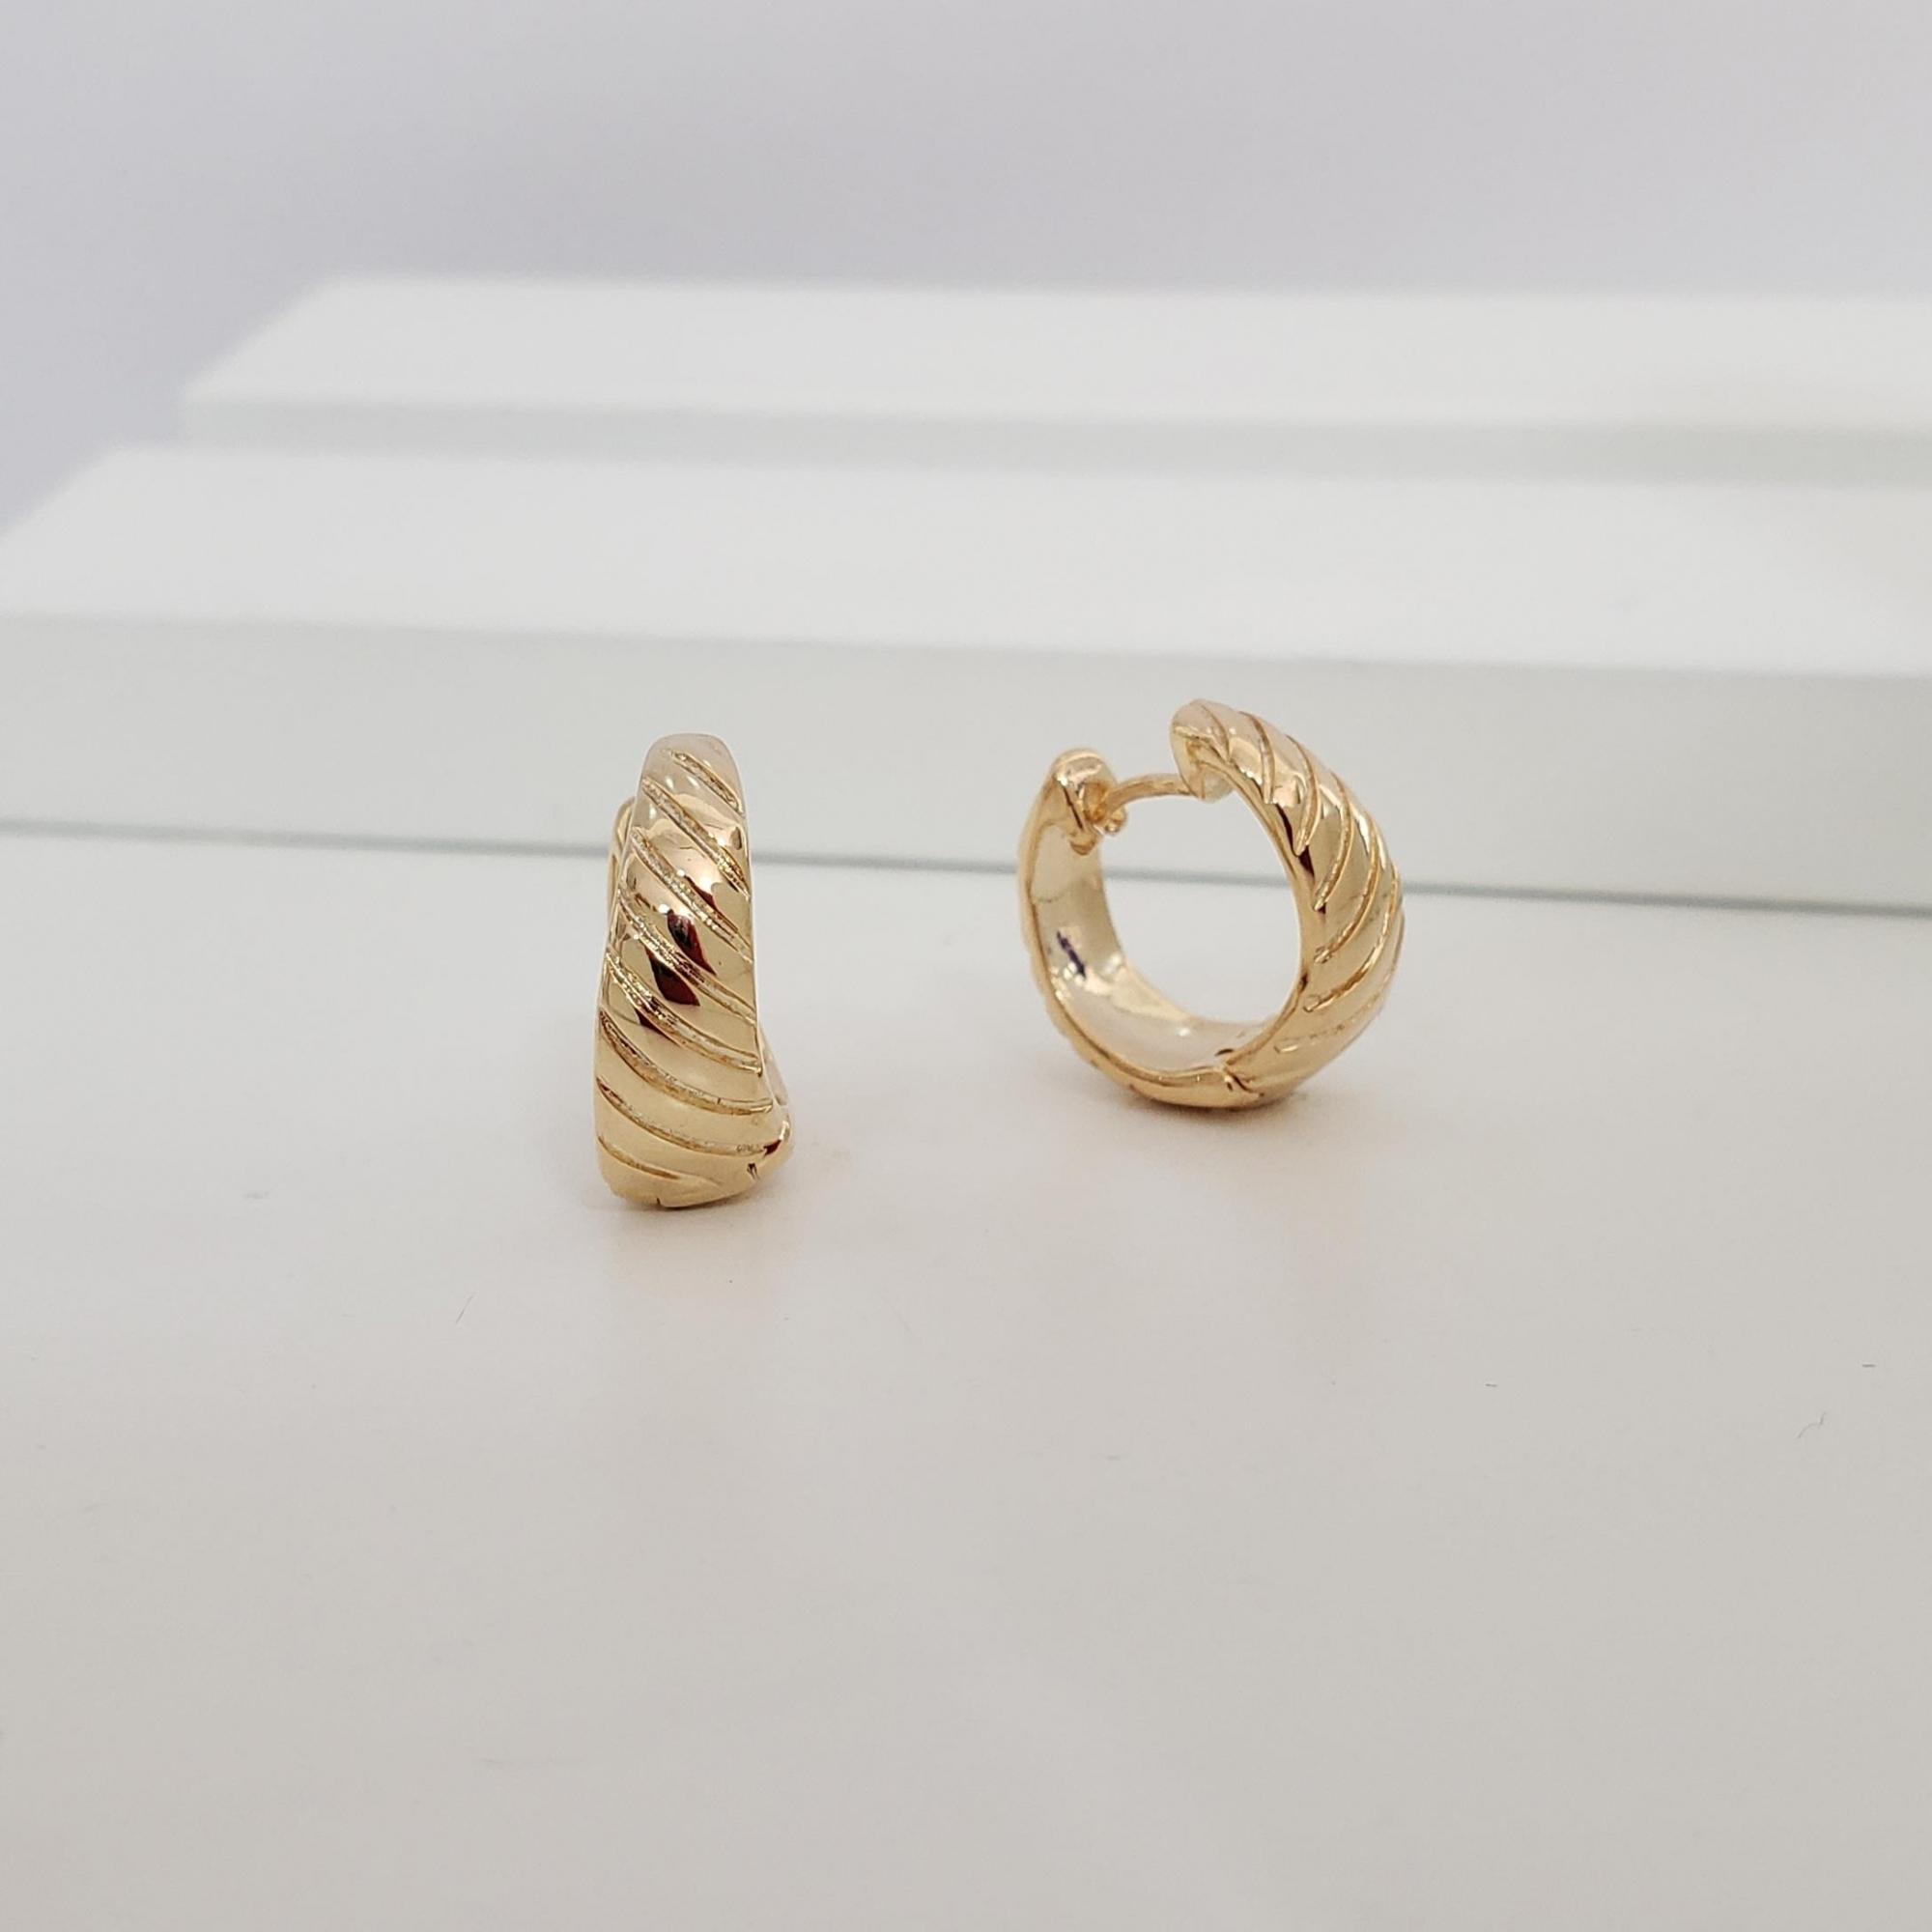 Brinco Argola 1,5cm Detalhes FRisados Diagonal no Banho Ouro 18k Semijoia